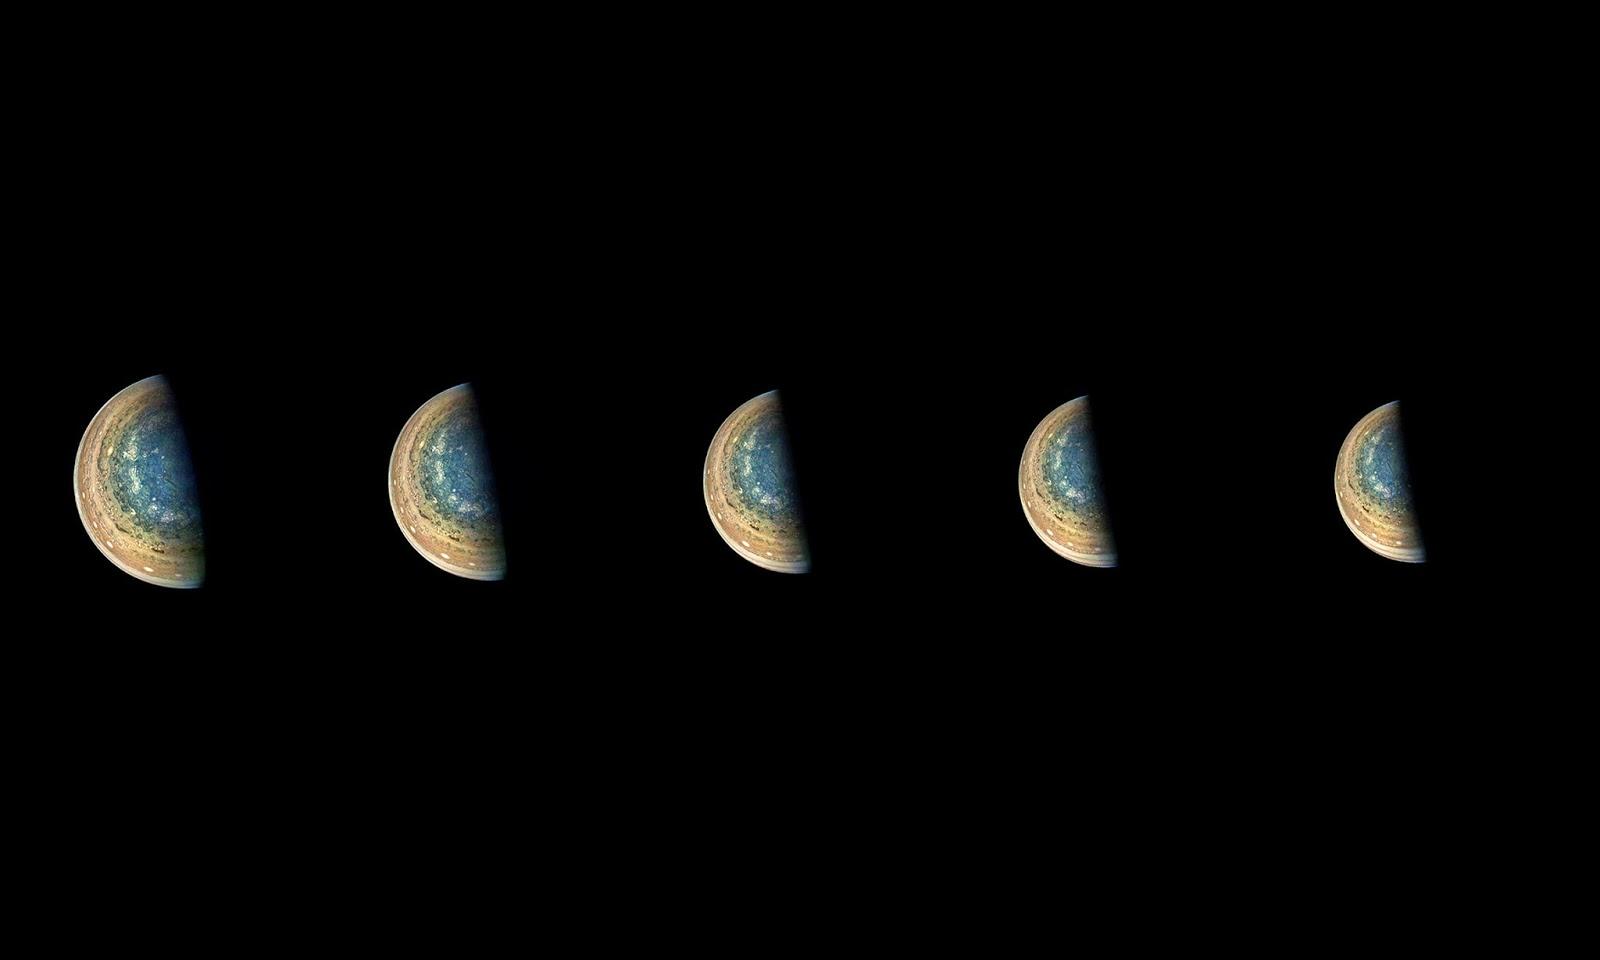 Image Credit: Gerald Eichstadt/NASA/JPL-Caltech/SwRI/MSSS